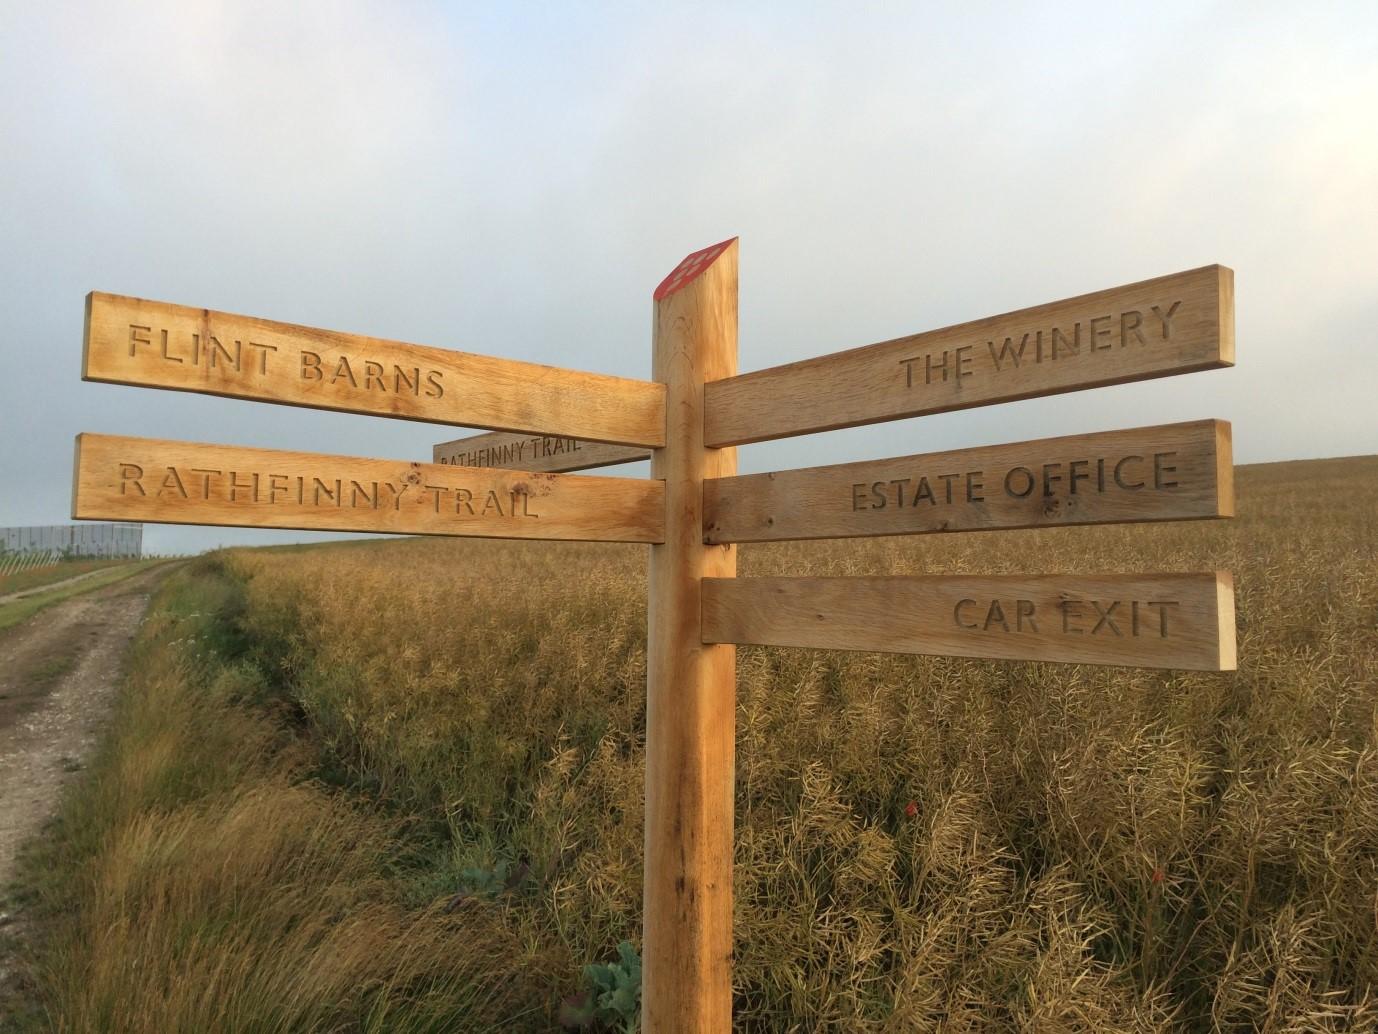 Rathfinny Trail signpost